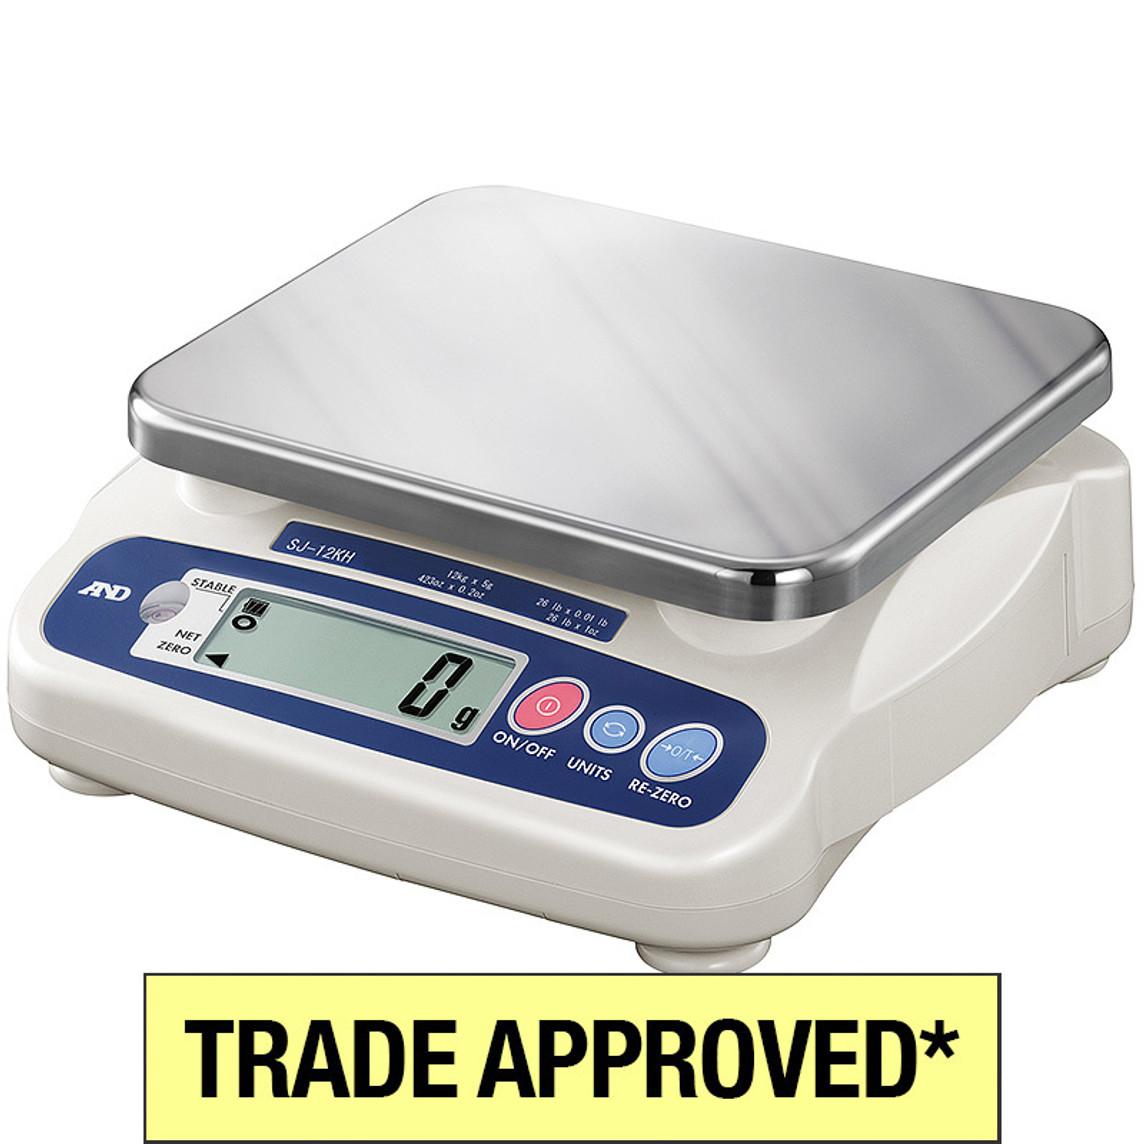 A&D SJHS Trade Verified Gram Scales